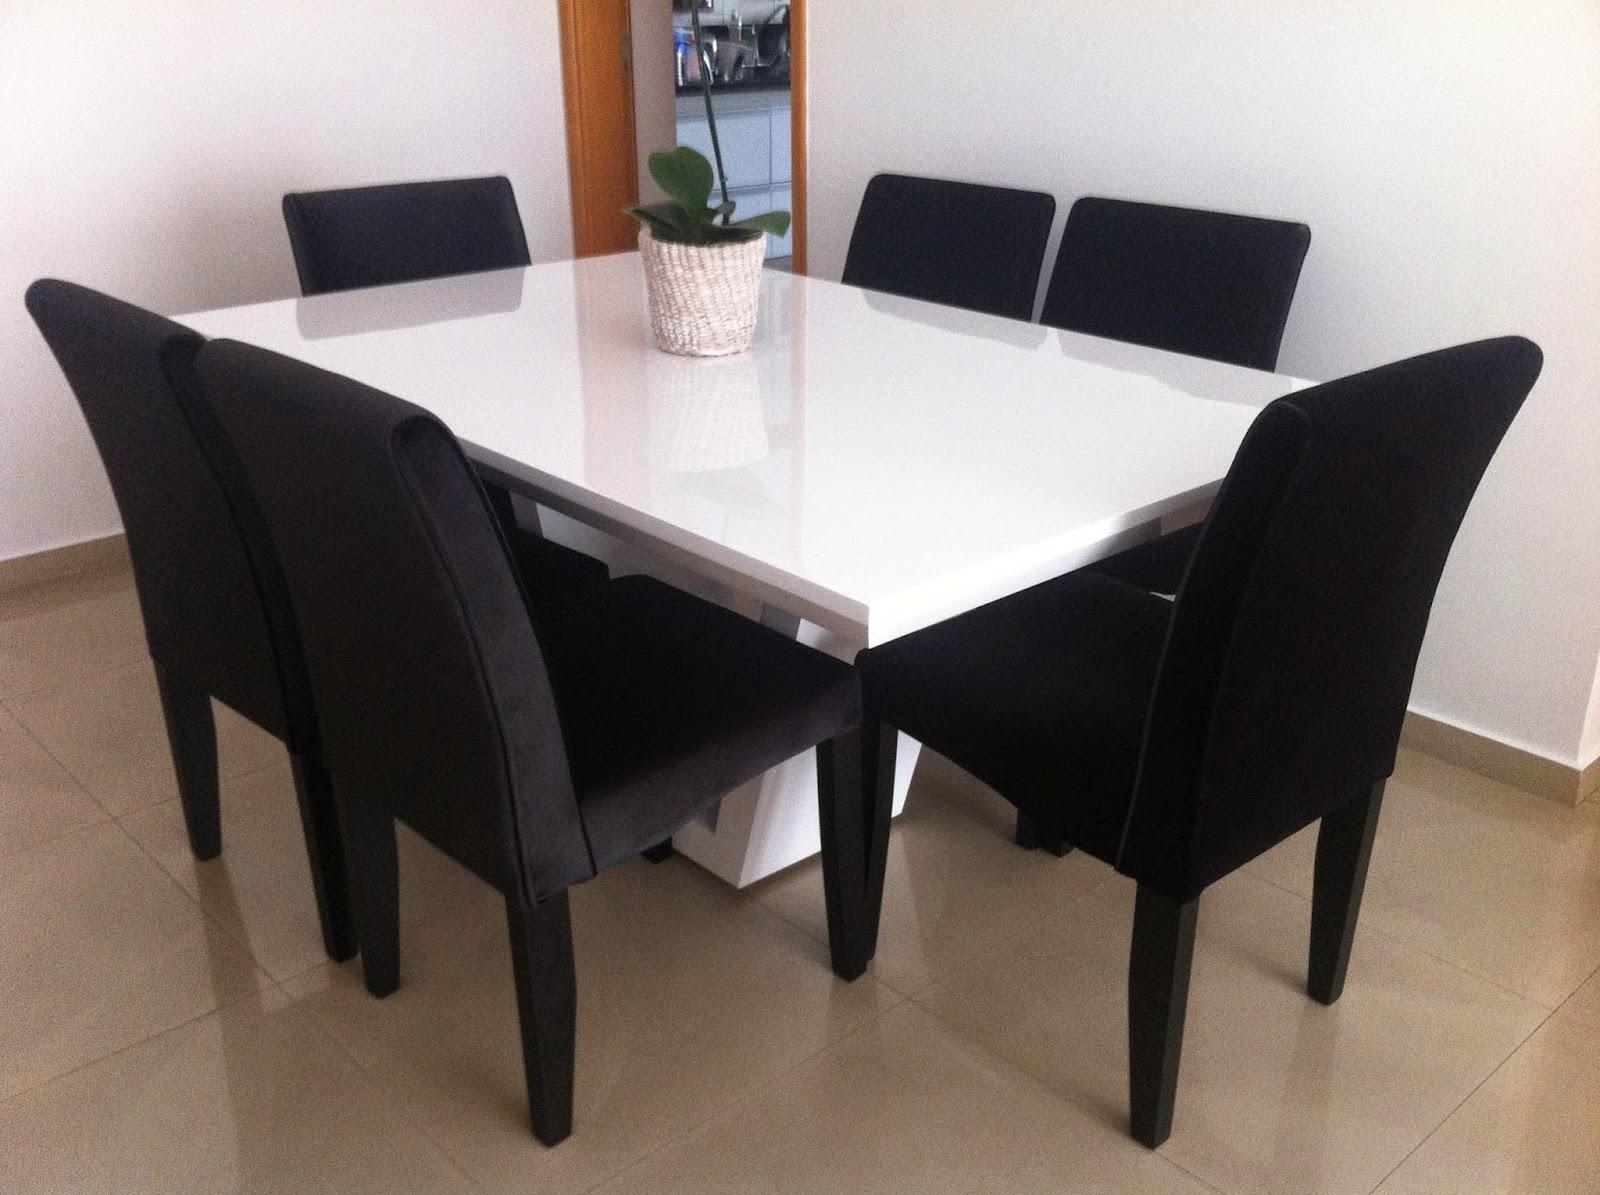 Mesa Para Area Gourmet Ucbuemesa De Jantar Ucbue Tronco De Rvore A  -> Sala De Jantar Pequena Com Mesa De Marmore